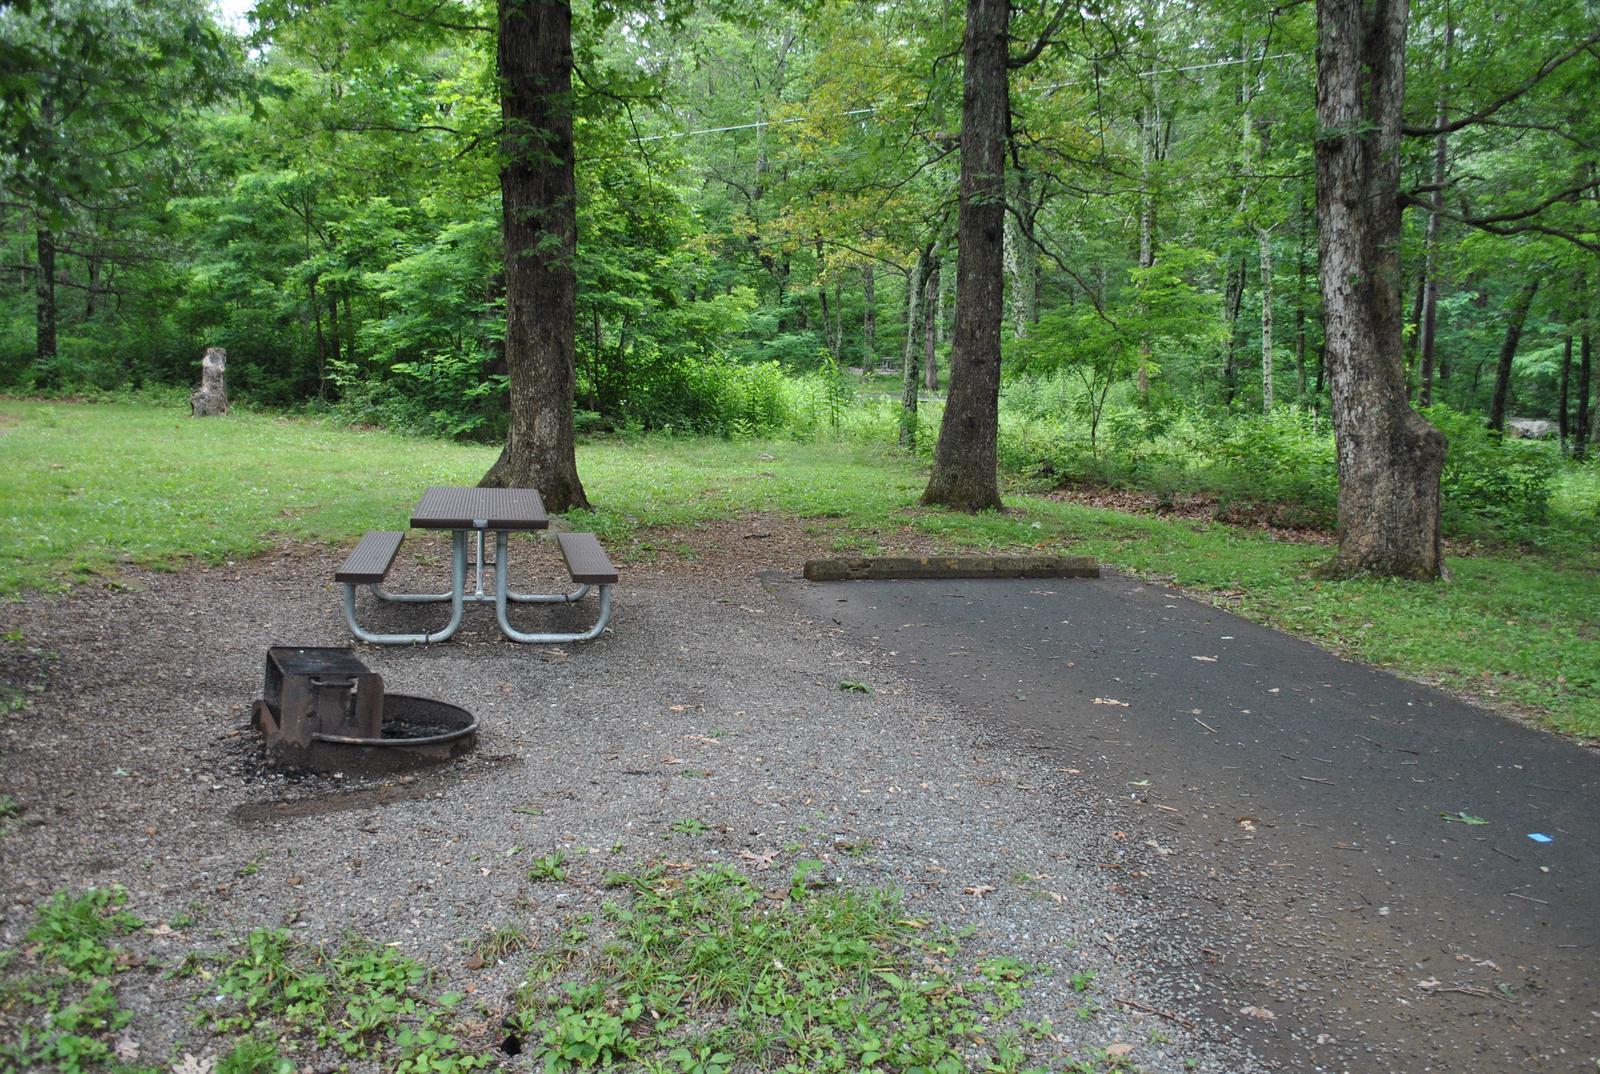 Mathews Arm Campground – Site A081